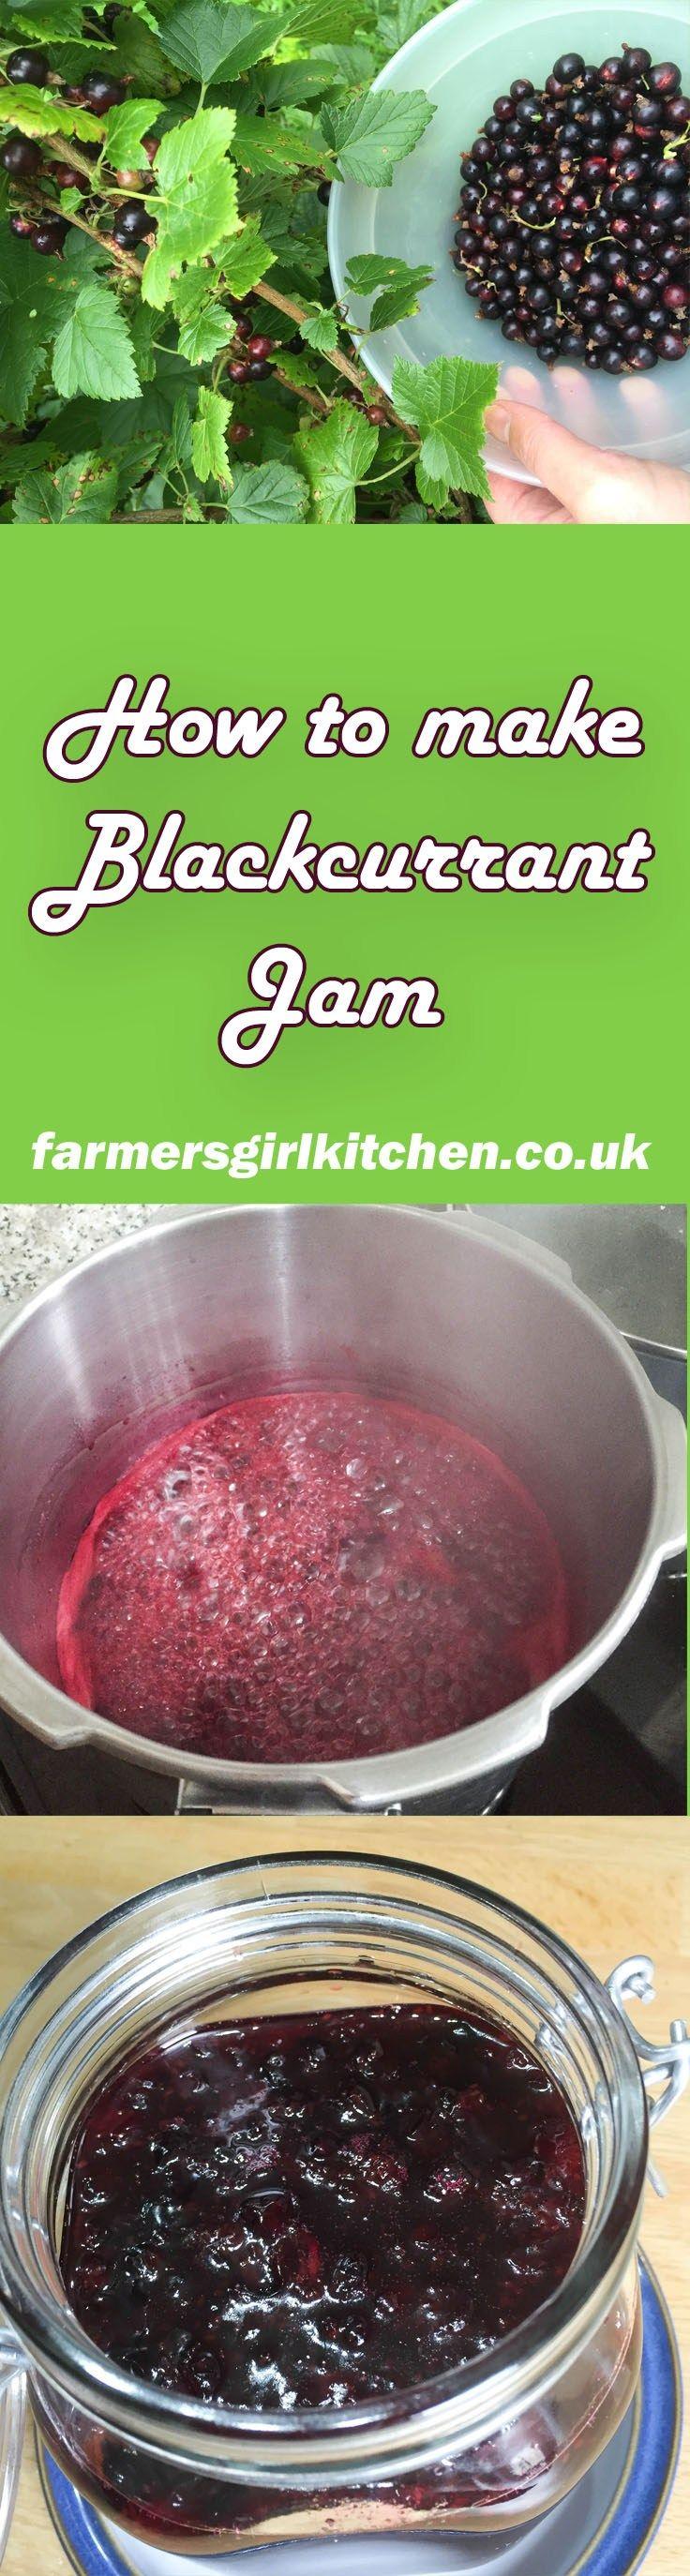 How to make Blackcurrant Jam